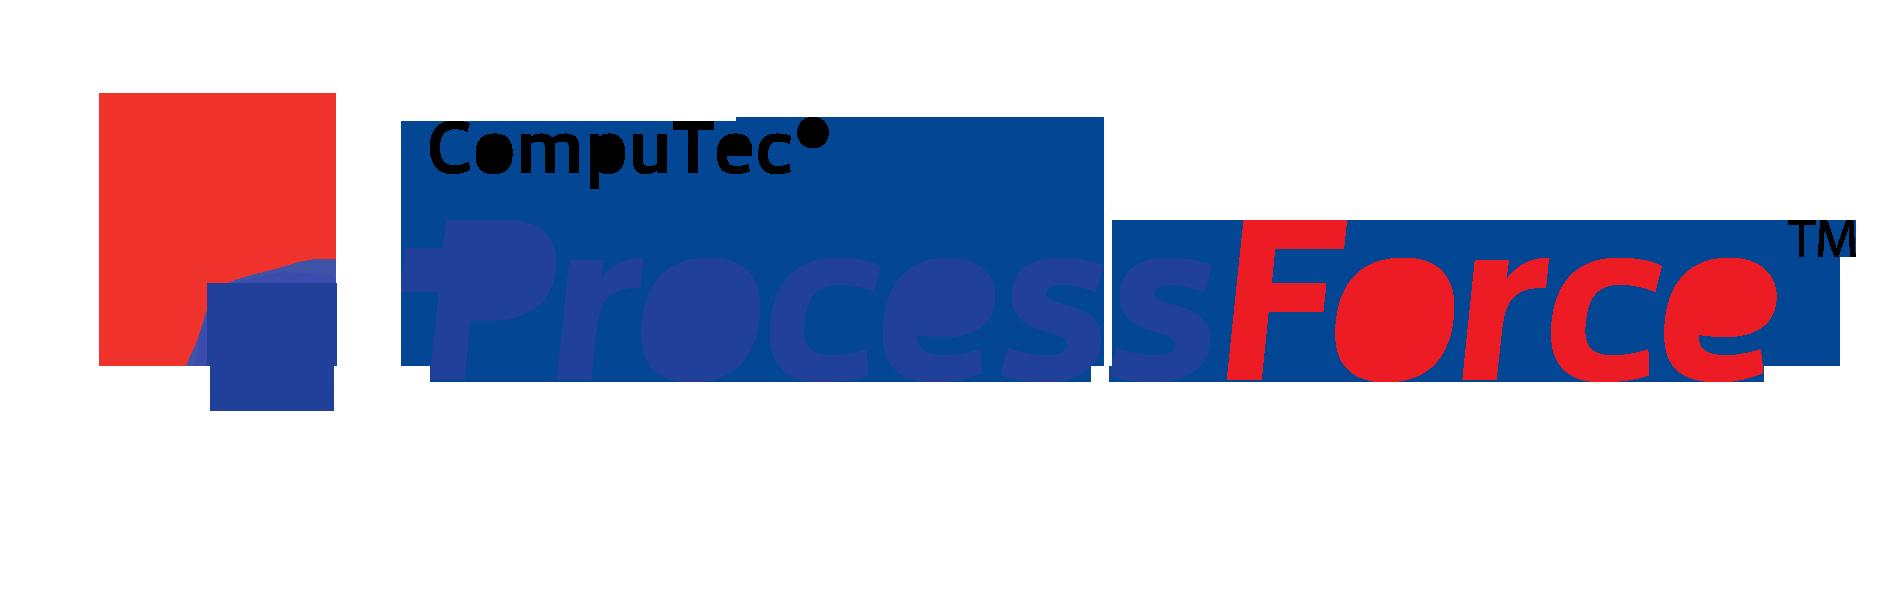 CompuTec ermöglicht ProcessForce-Lösung auf Cloudiax - Picture Blog